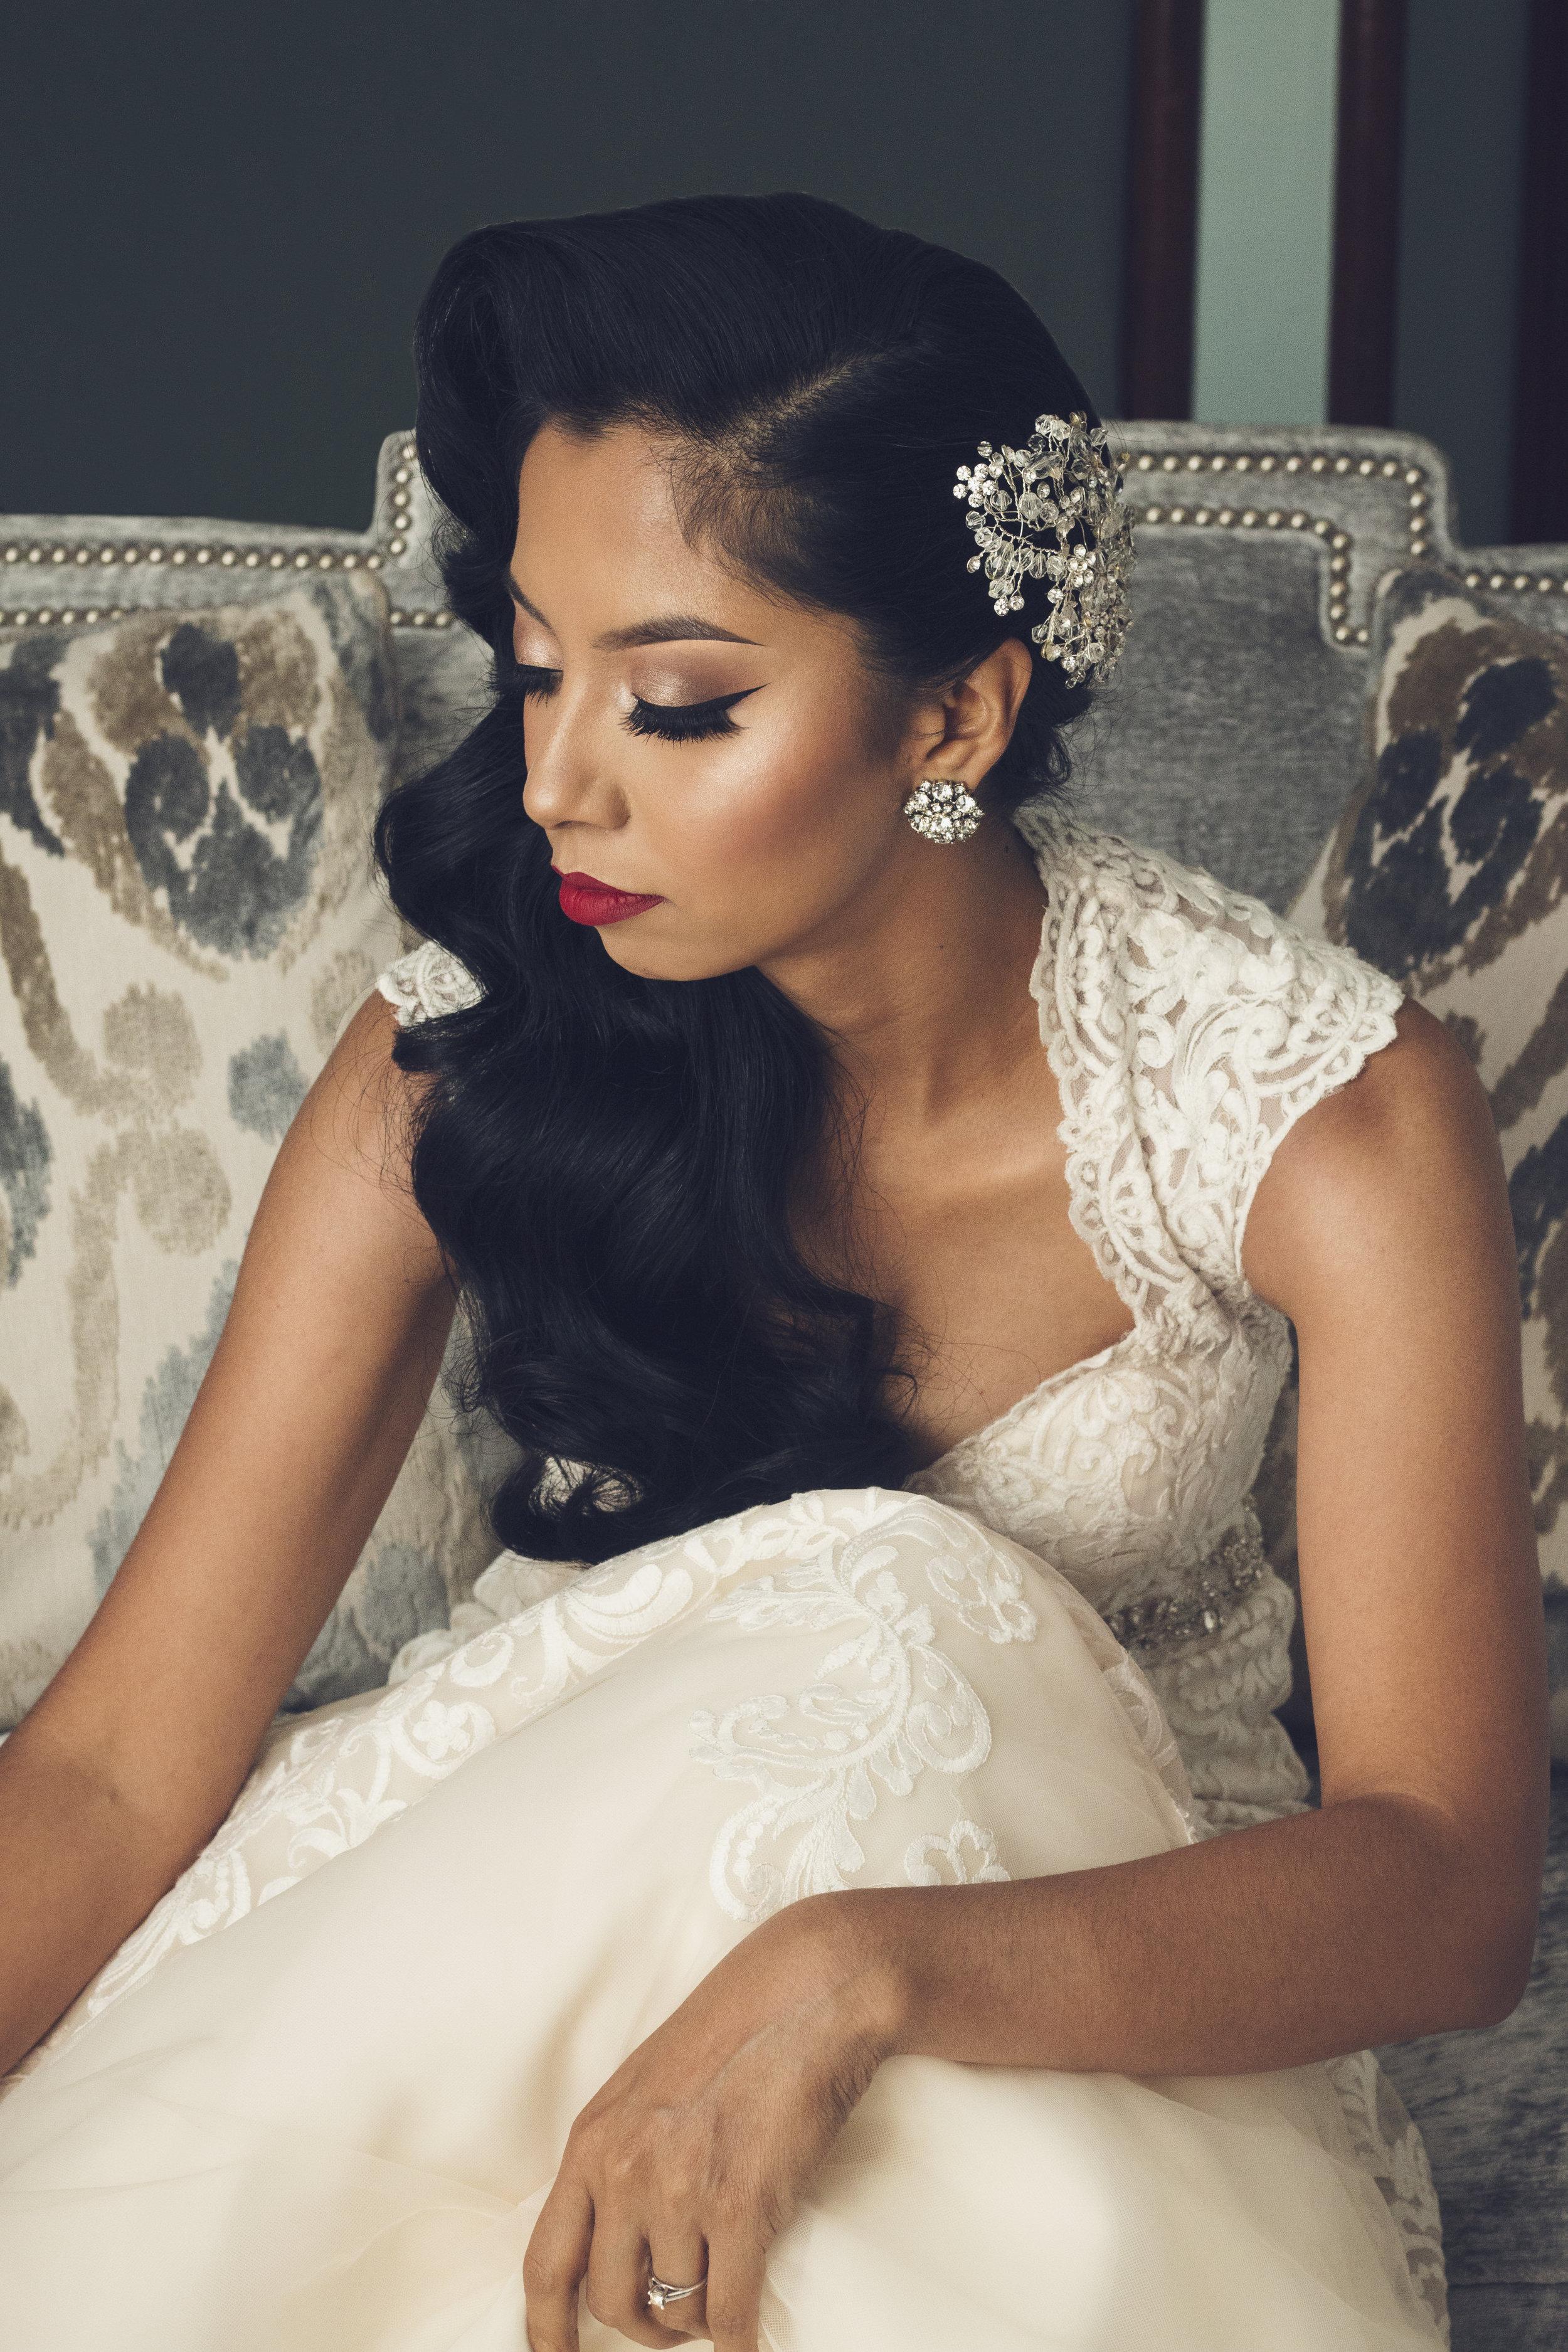 Bridal - Portaits & Wedding day